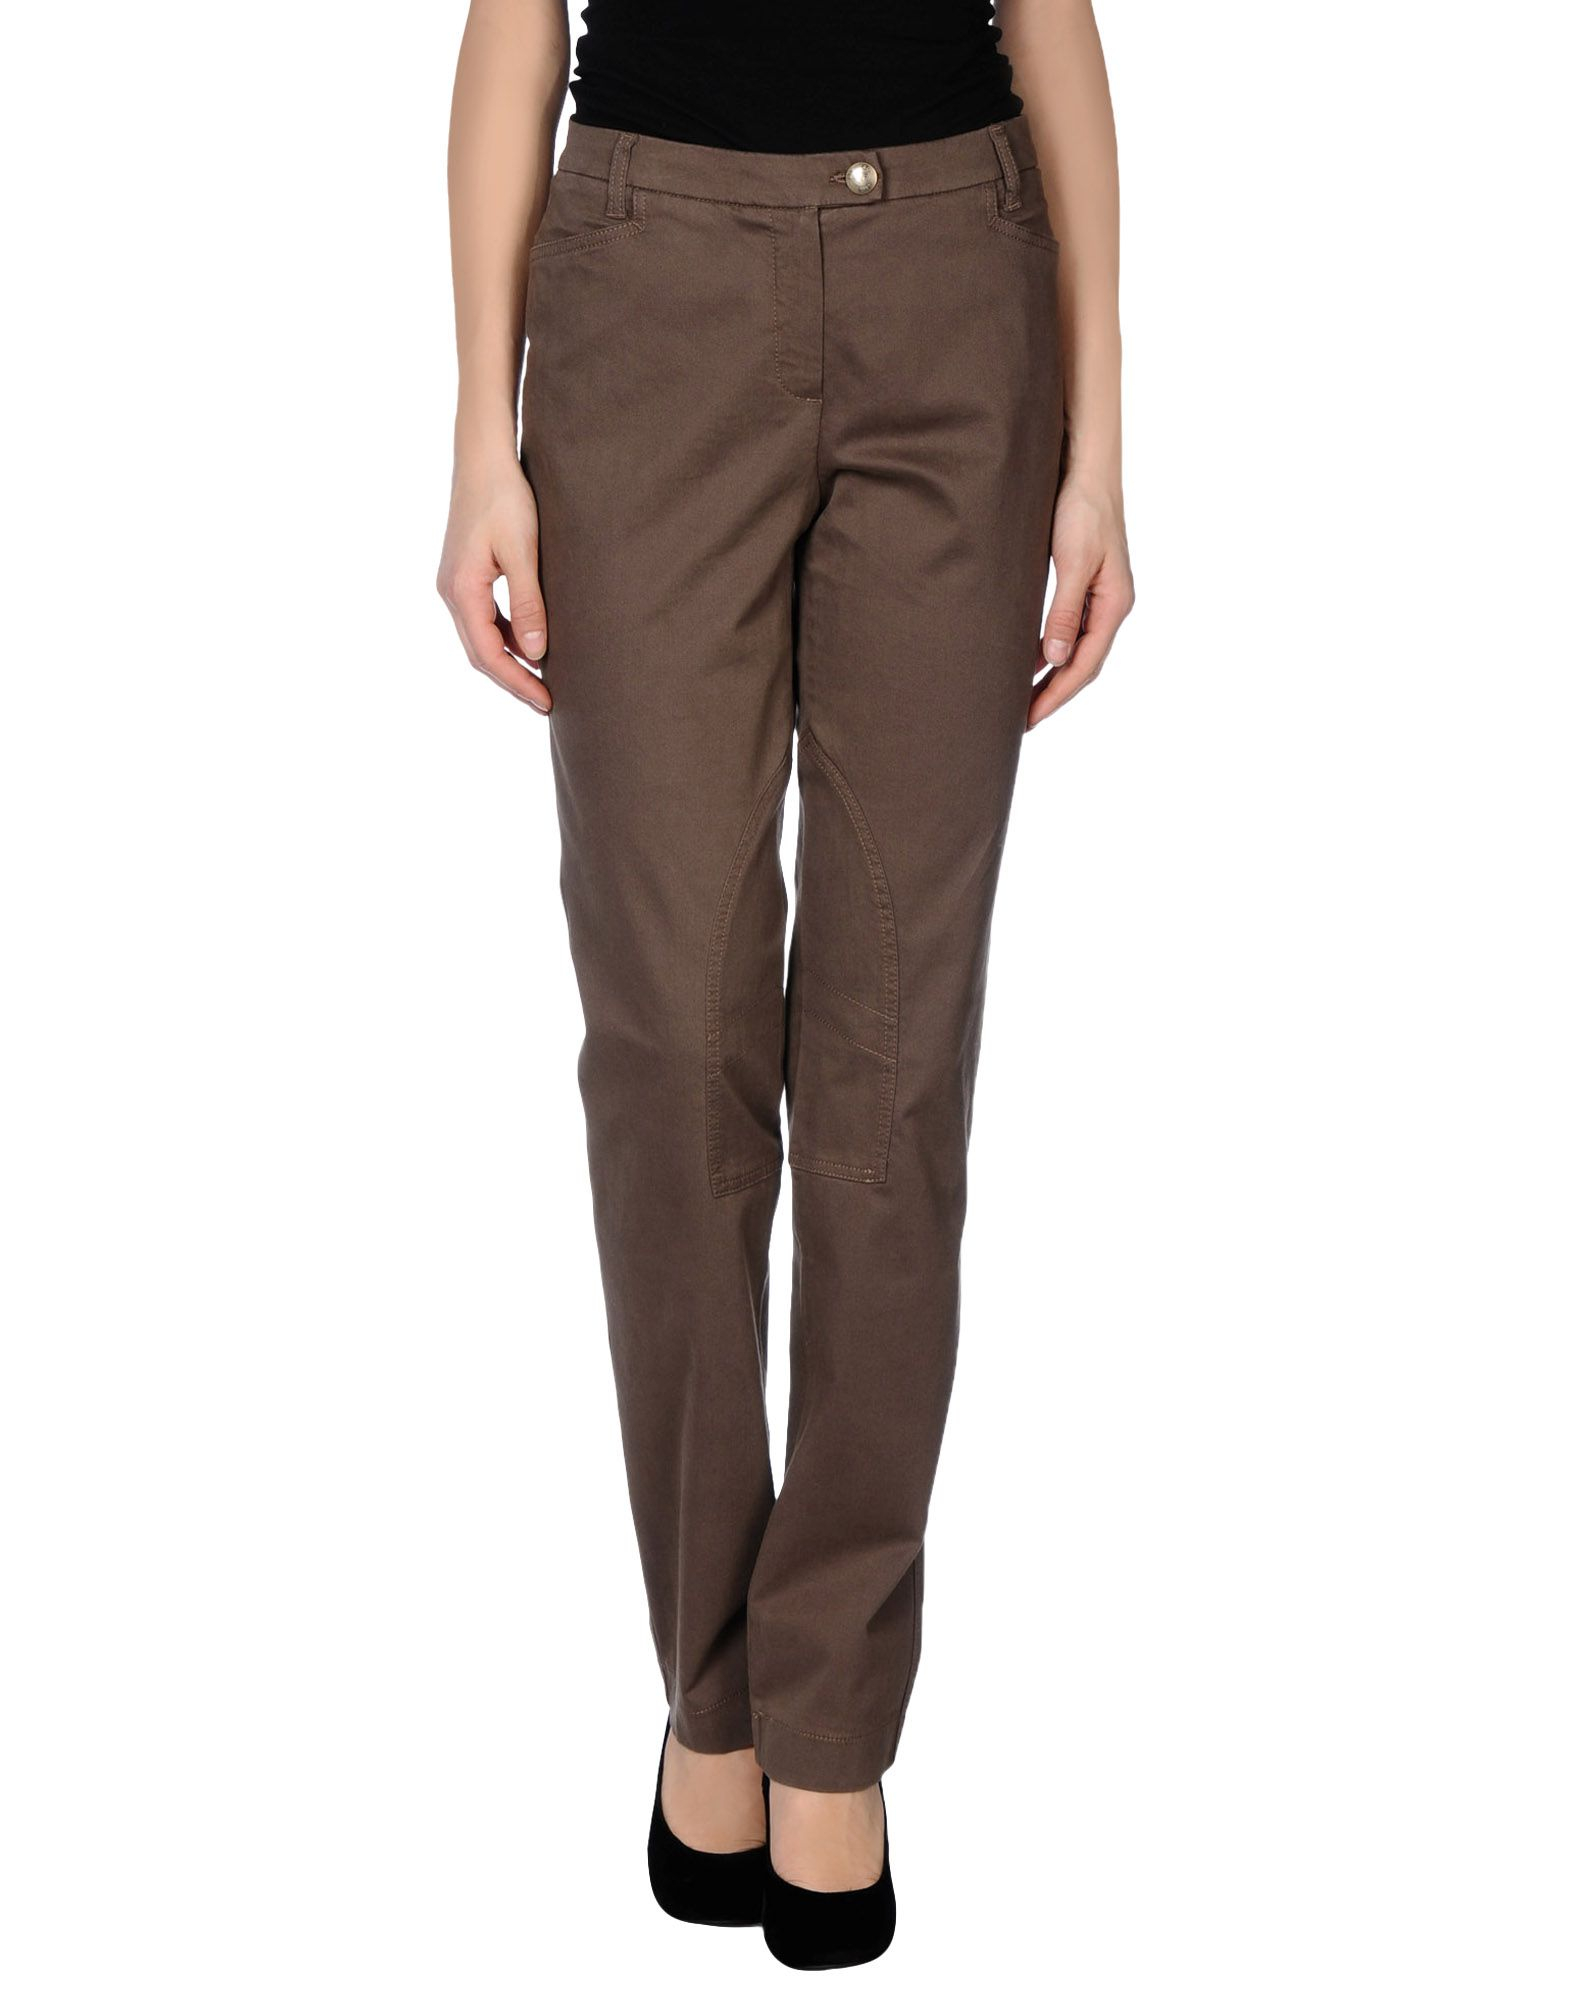 Beautiful Women39s Brown Capri Pants Size 2XL Cargo Khaki Capri Slacks With Belt